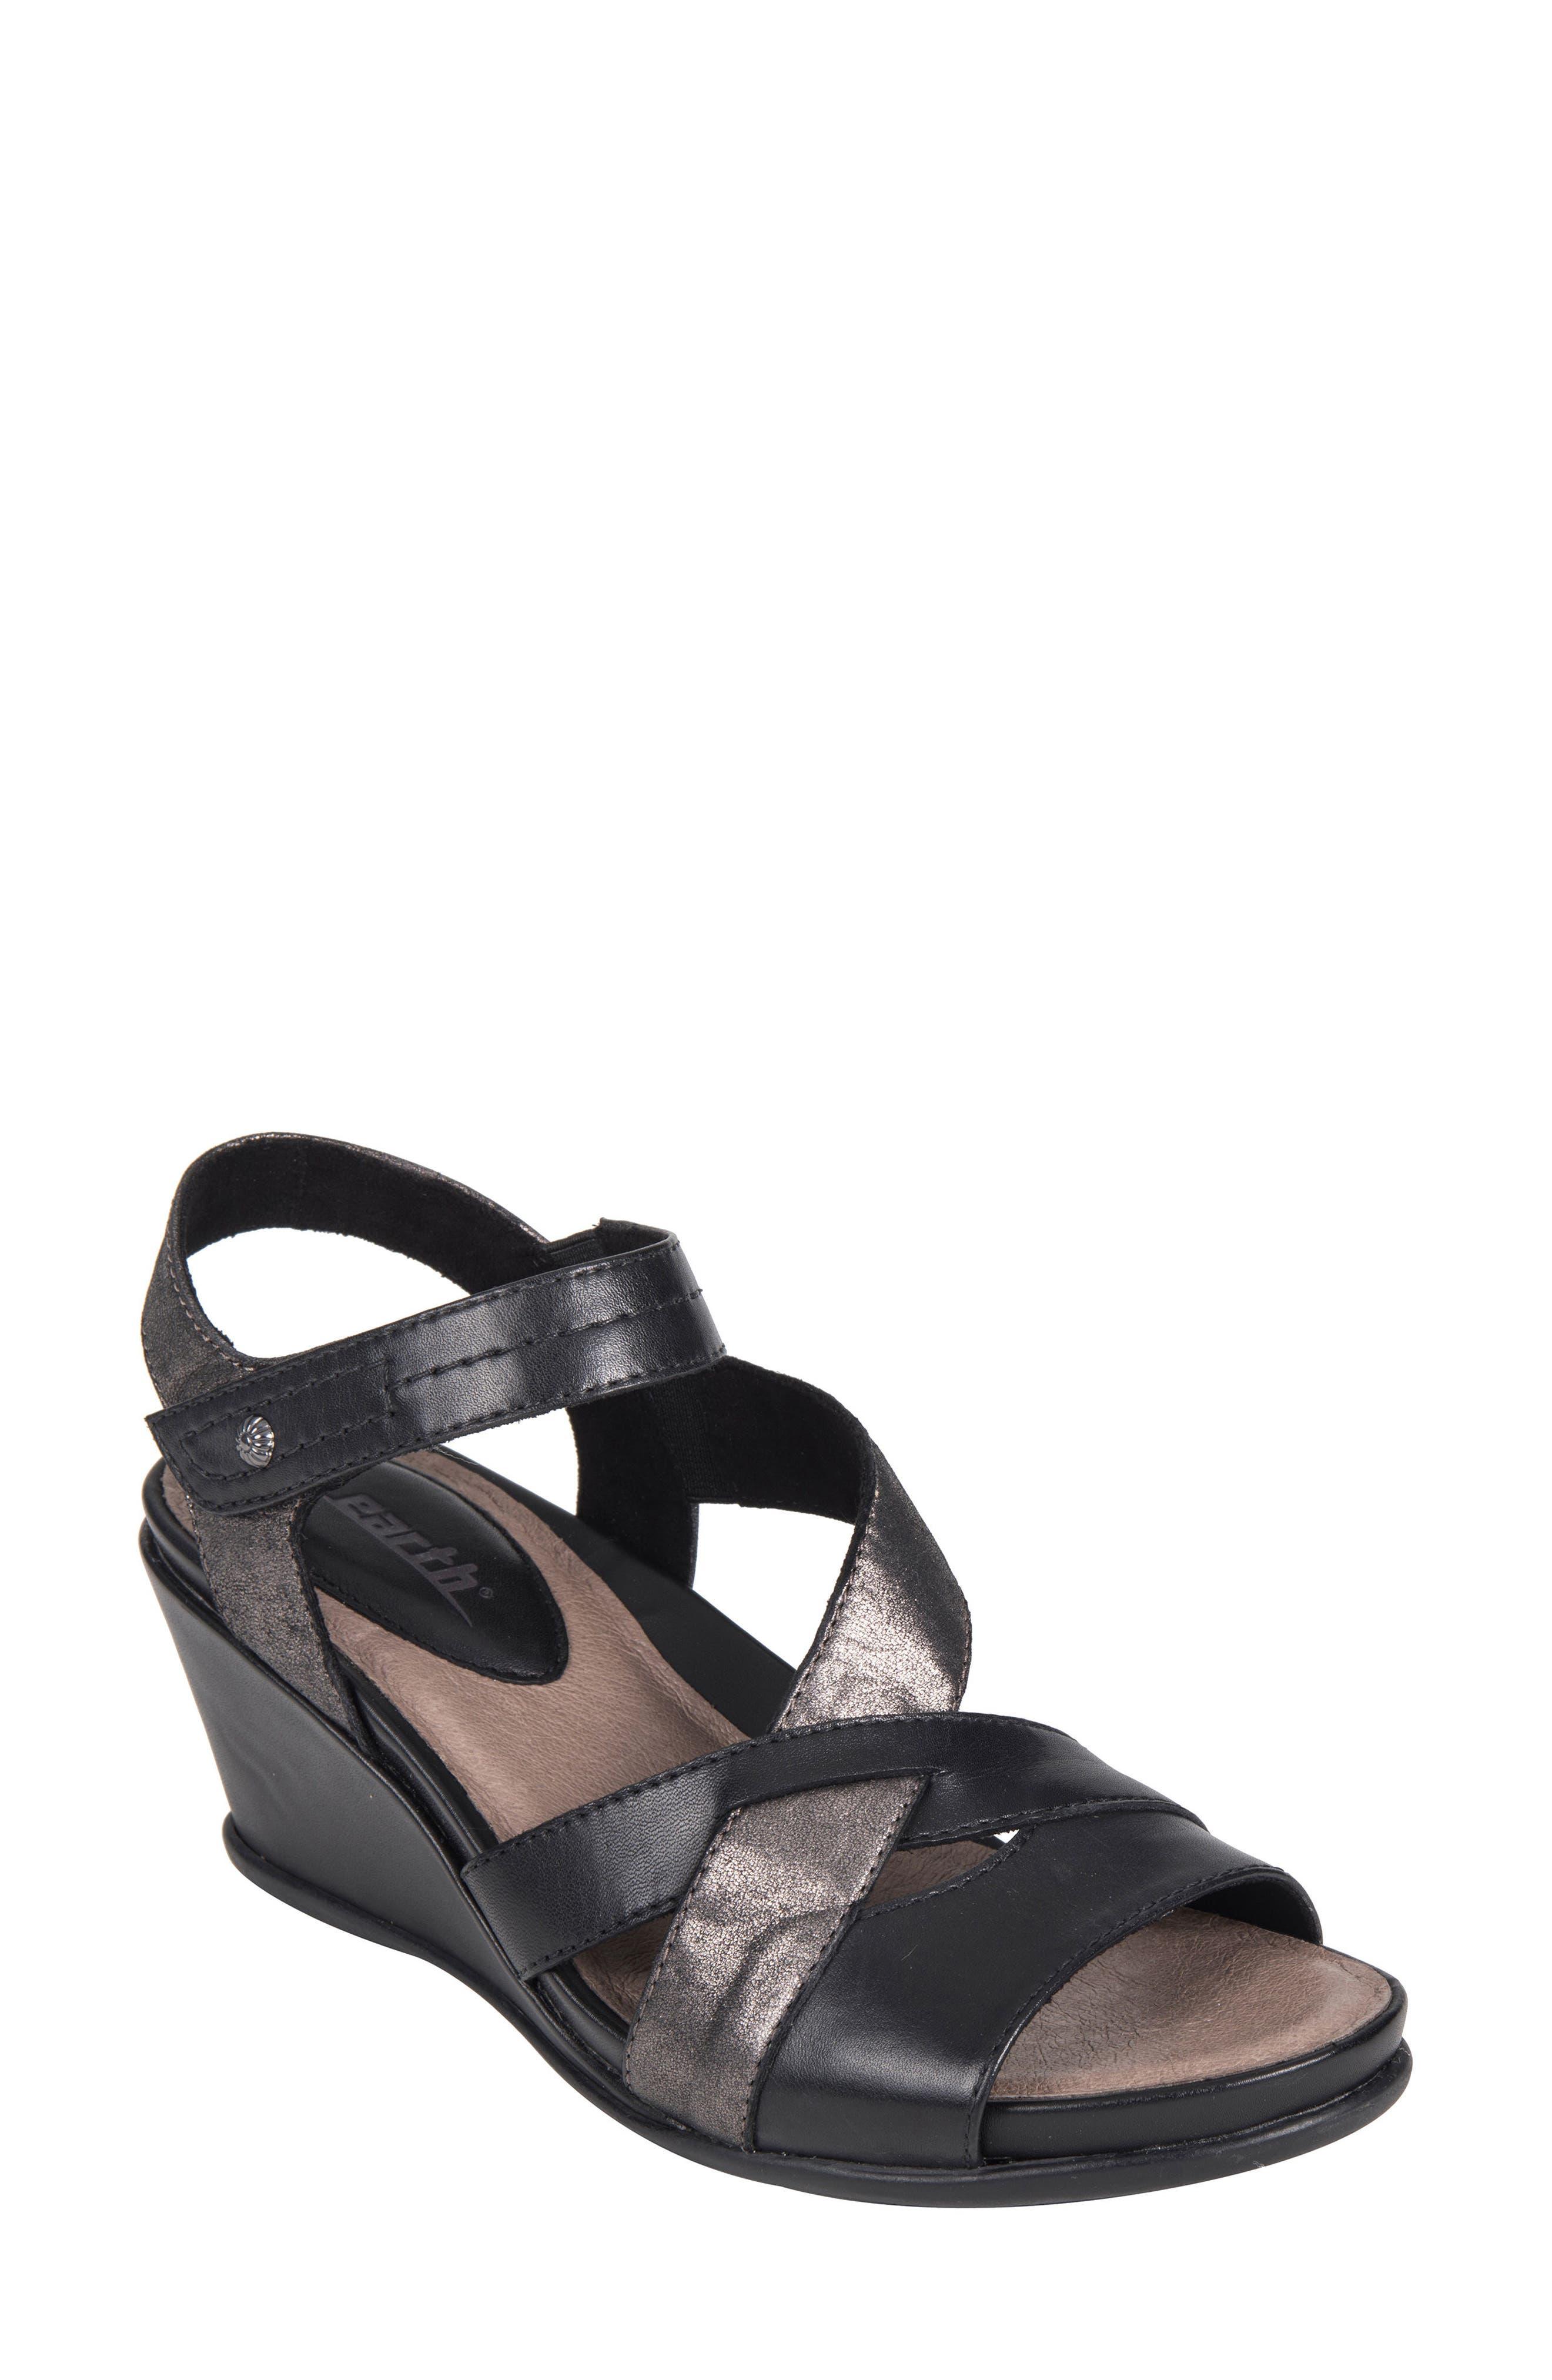 Thistle Wedge Sandal,                             Main thumbnail 1, color,